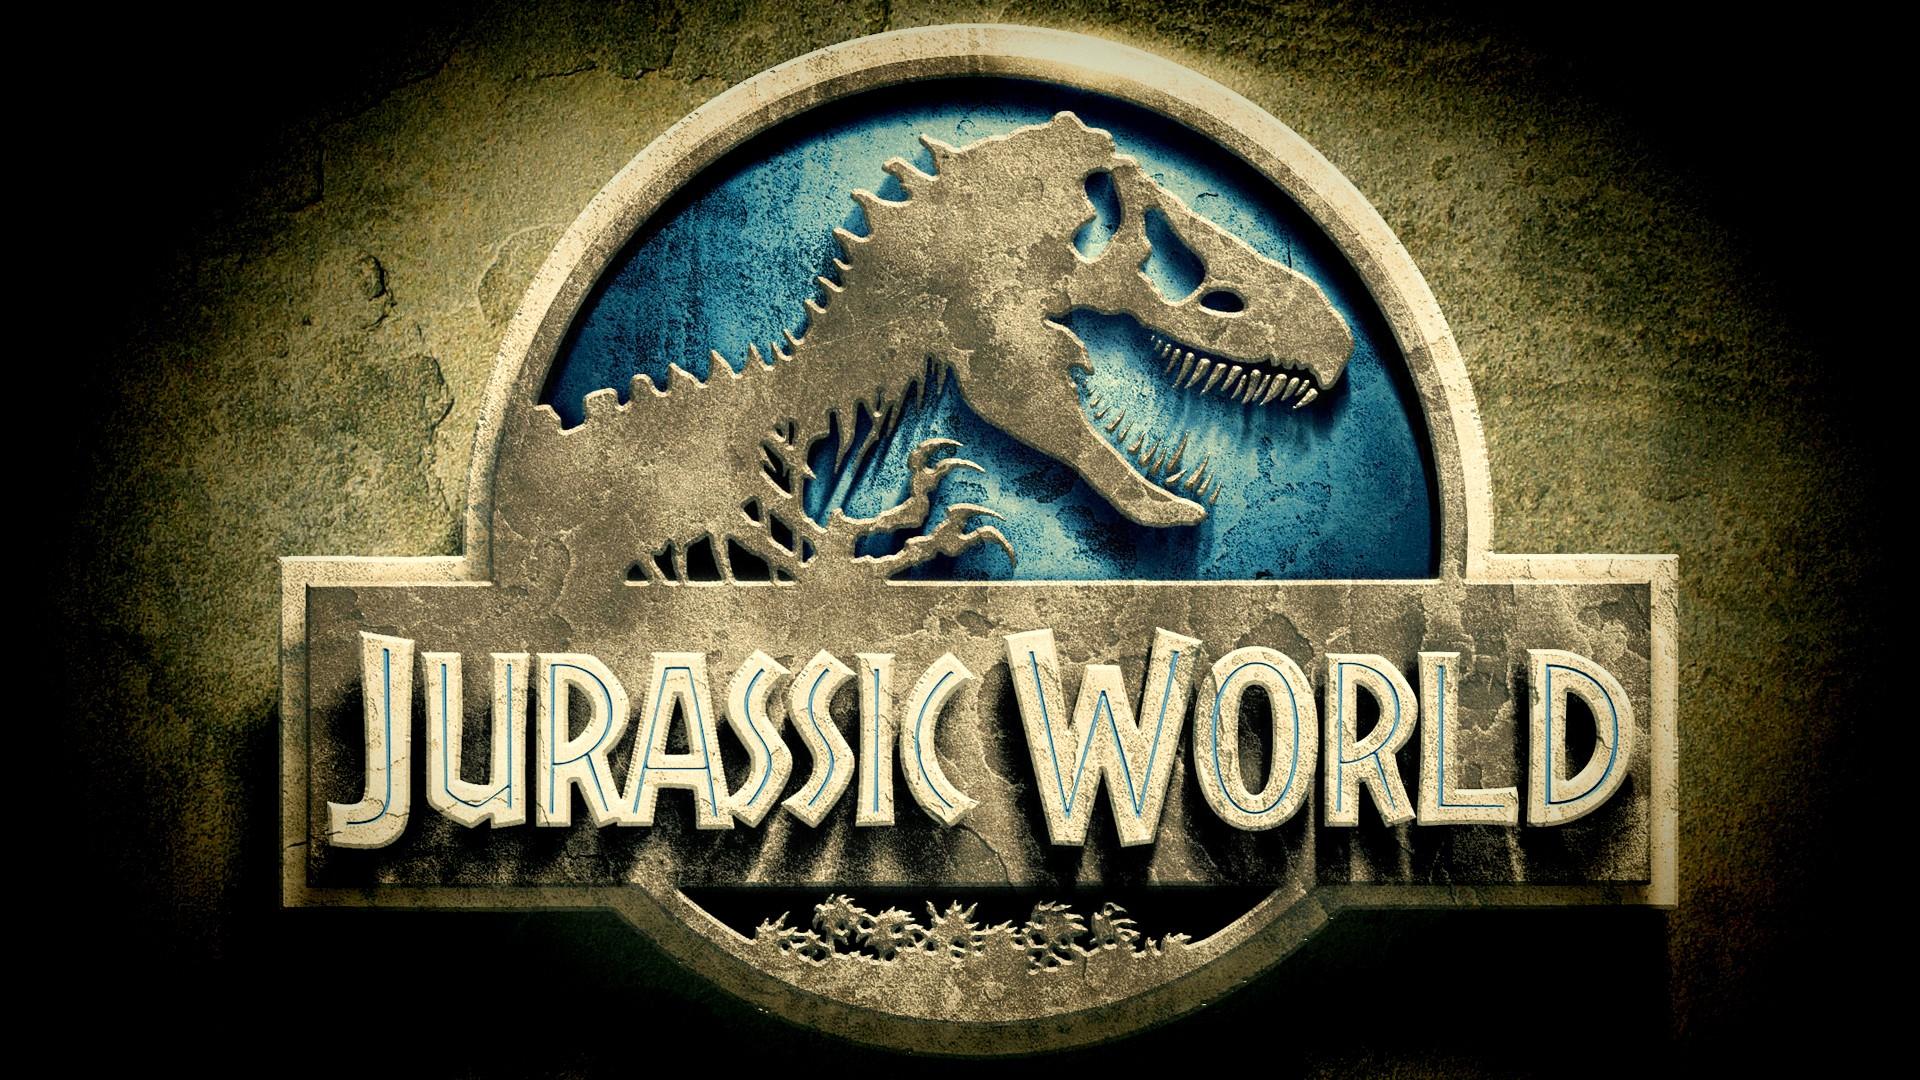 9 HD Jurassic World Movie Wallpapers